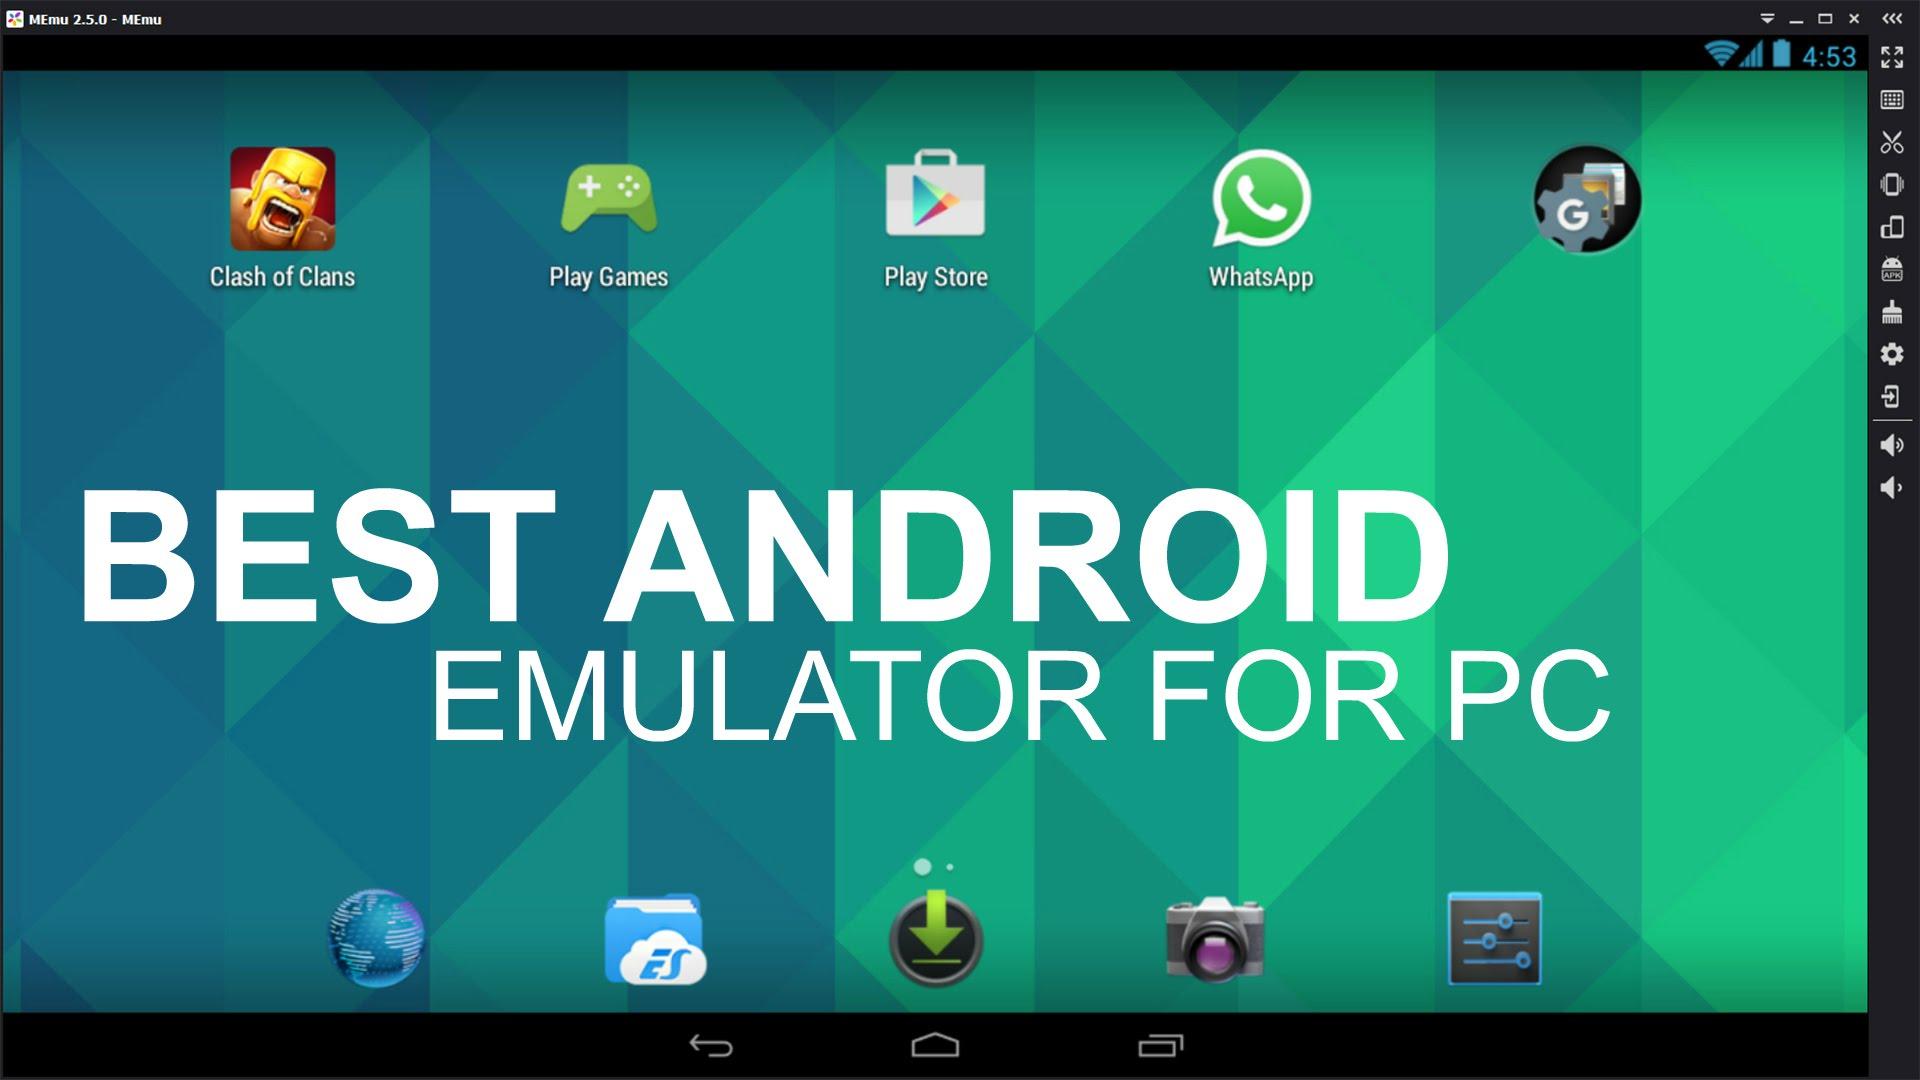 Paras PUBG-mobiiliemulaattori PC: lle (Windows 10 8.1. 7, Vista) - paras luettelo 1